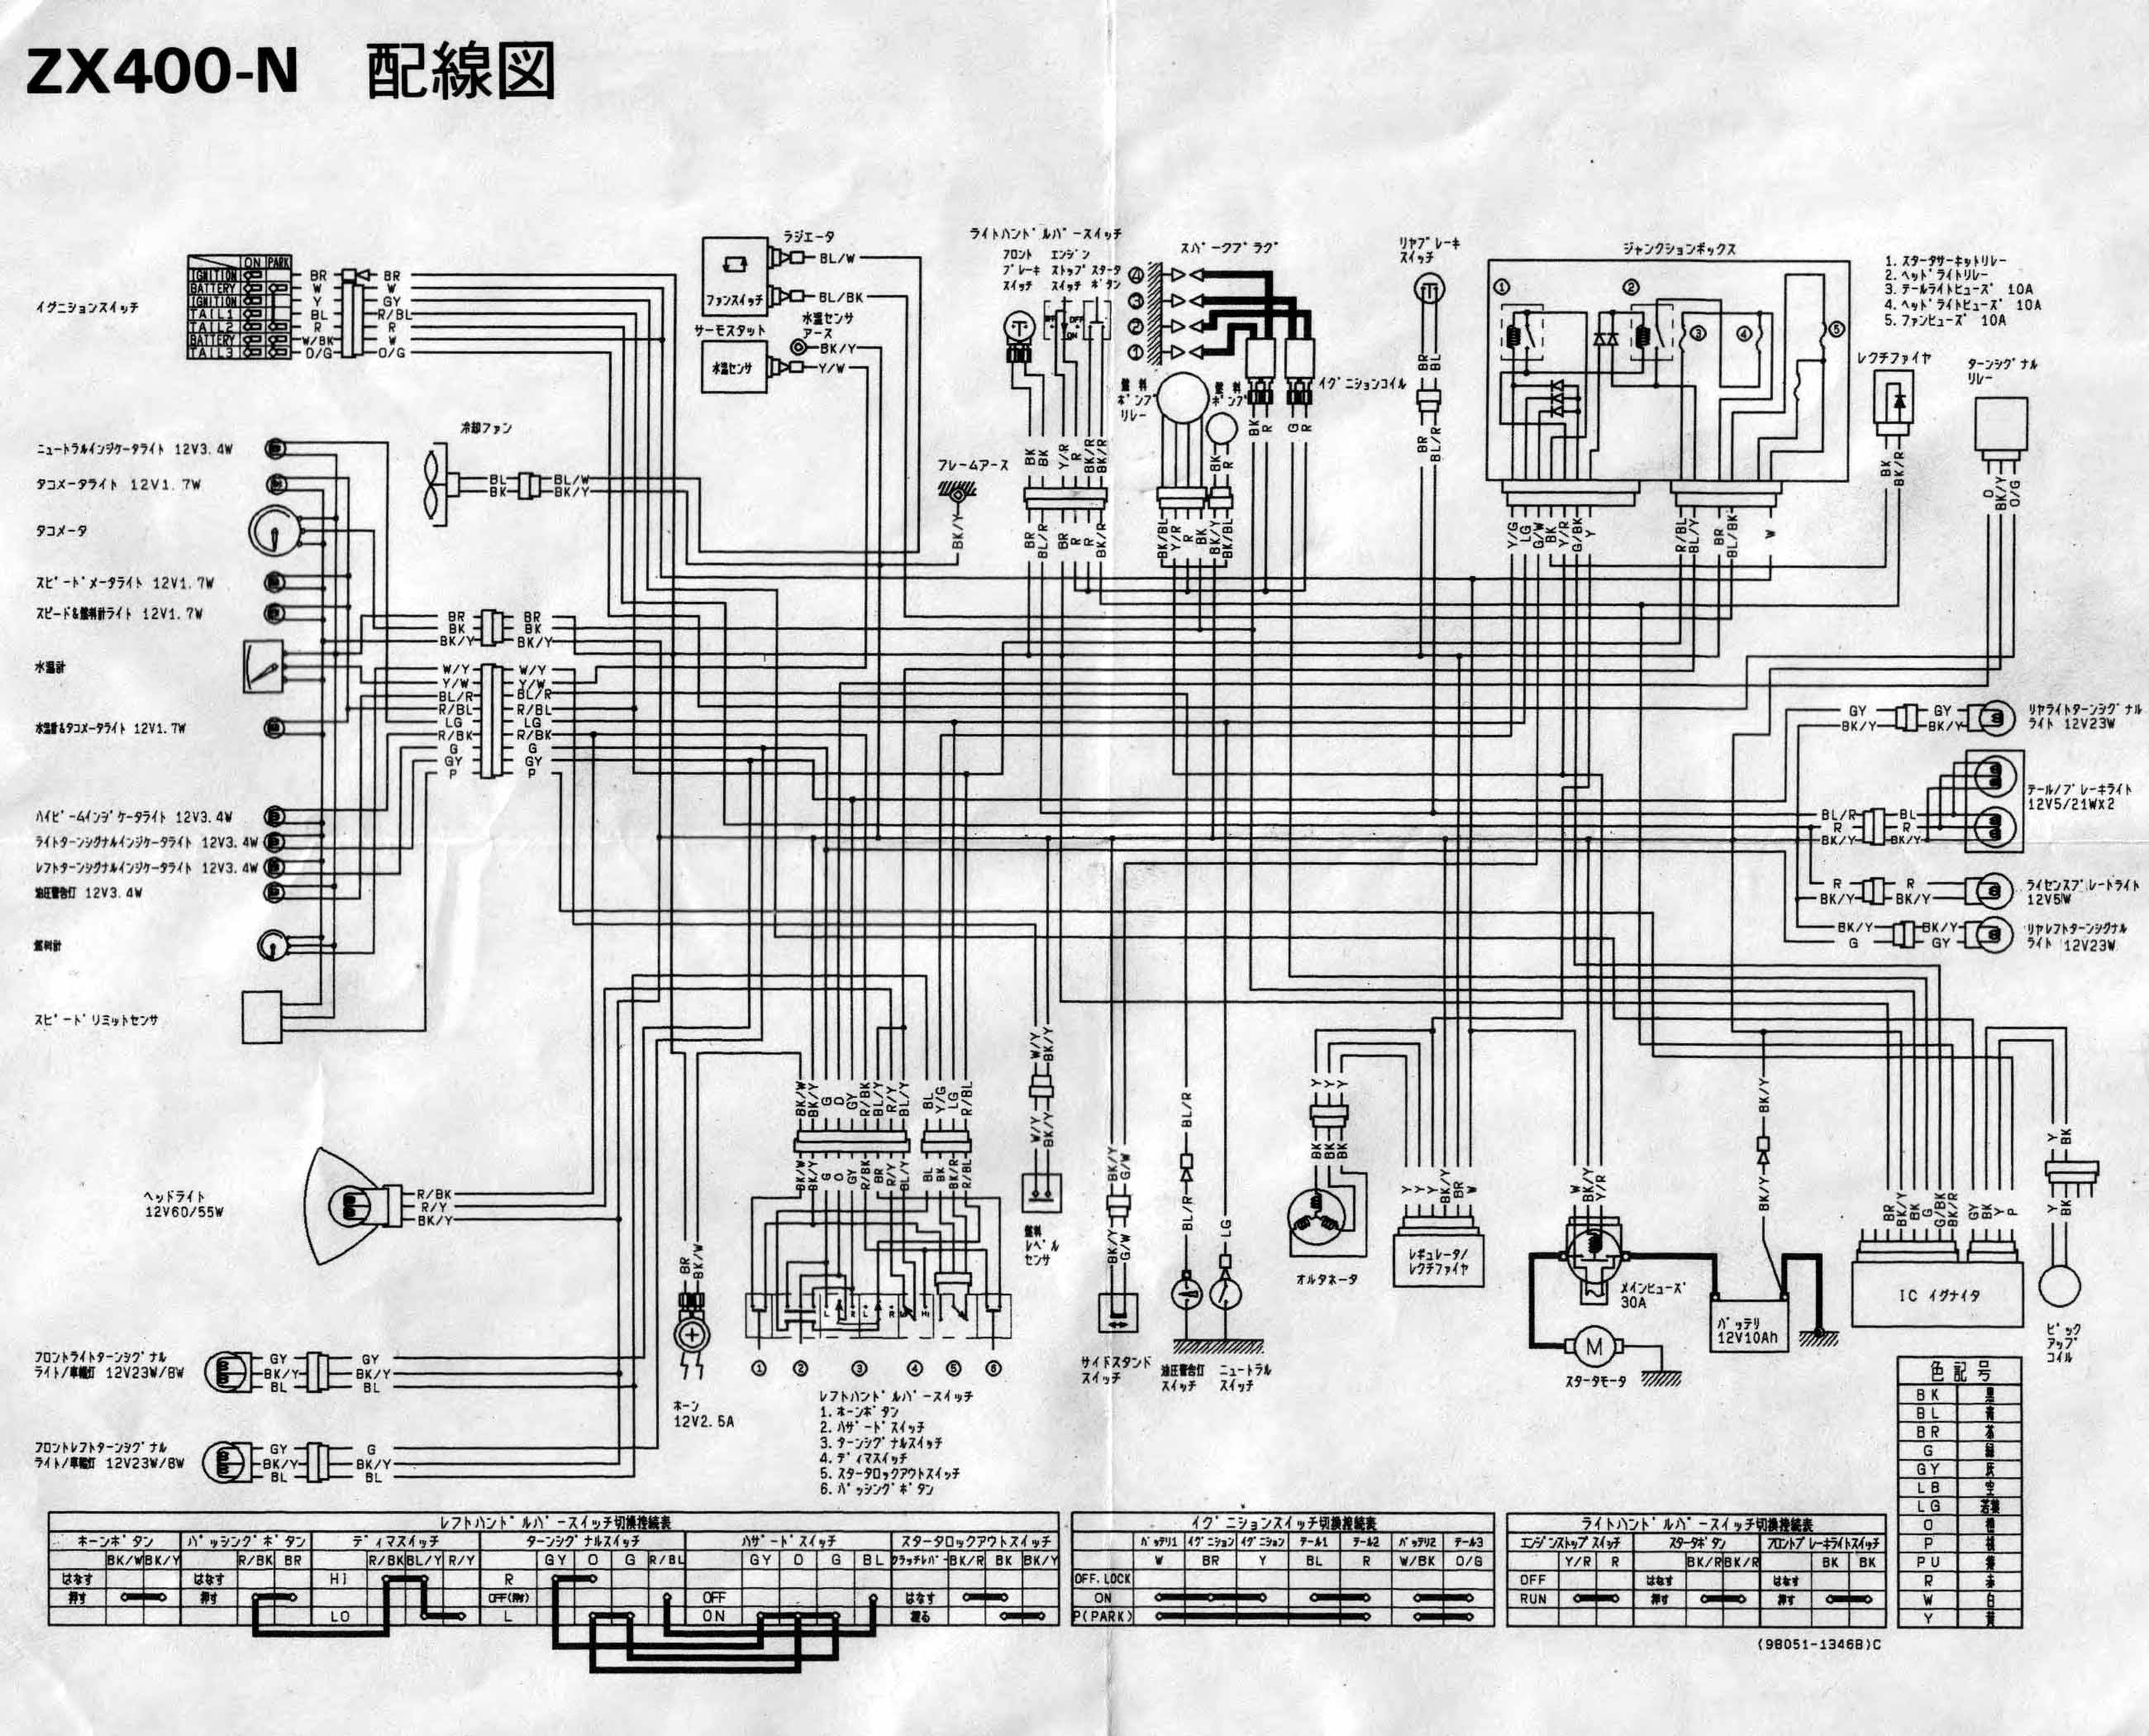 1996 Fzr 600 Wiring Diagram Schematic Electrical Schematics 96 Honda Cbr For Trusted F3 Parts